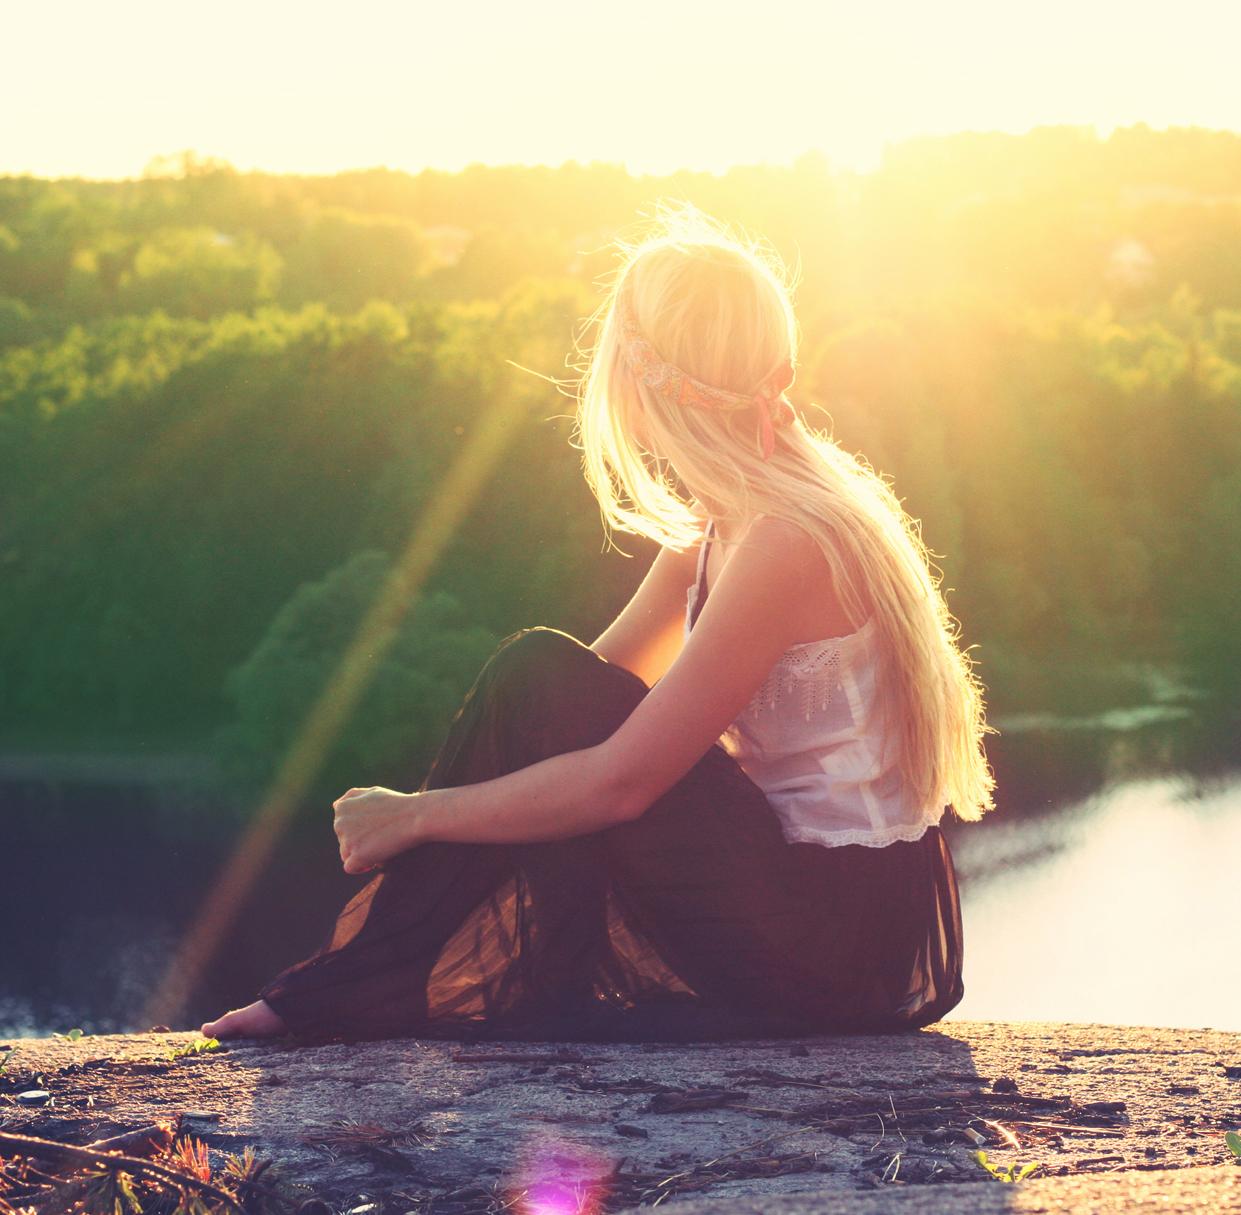 Sara B – Jag ville leva, njuta, sprudla